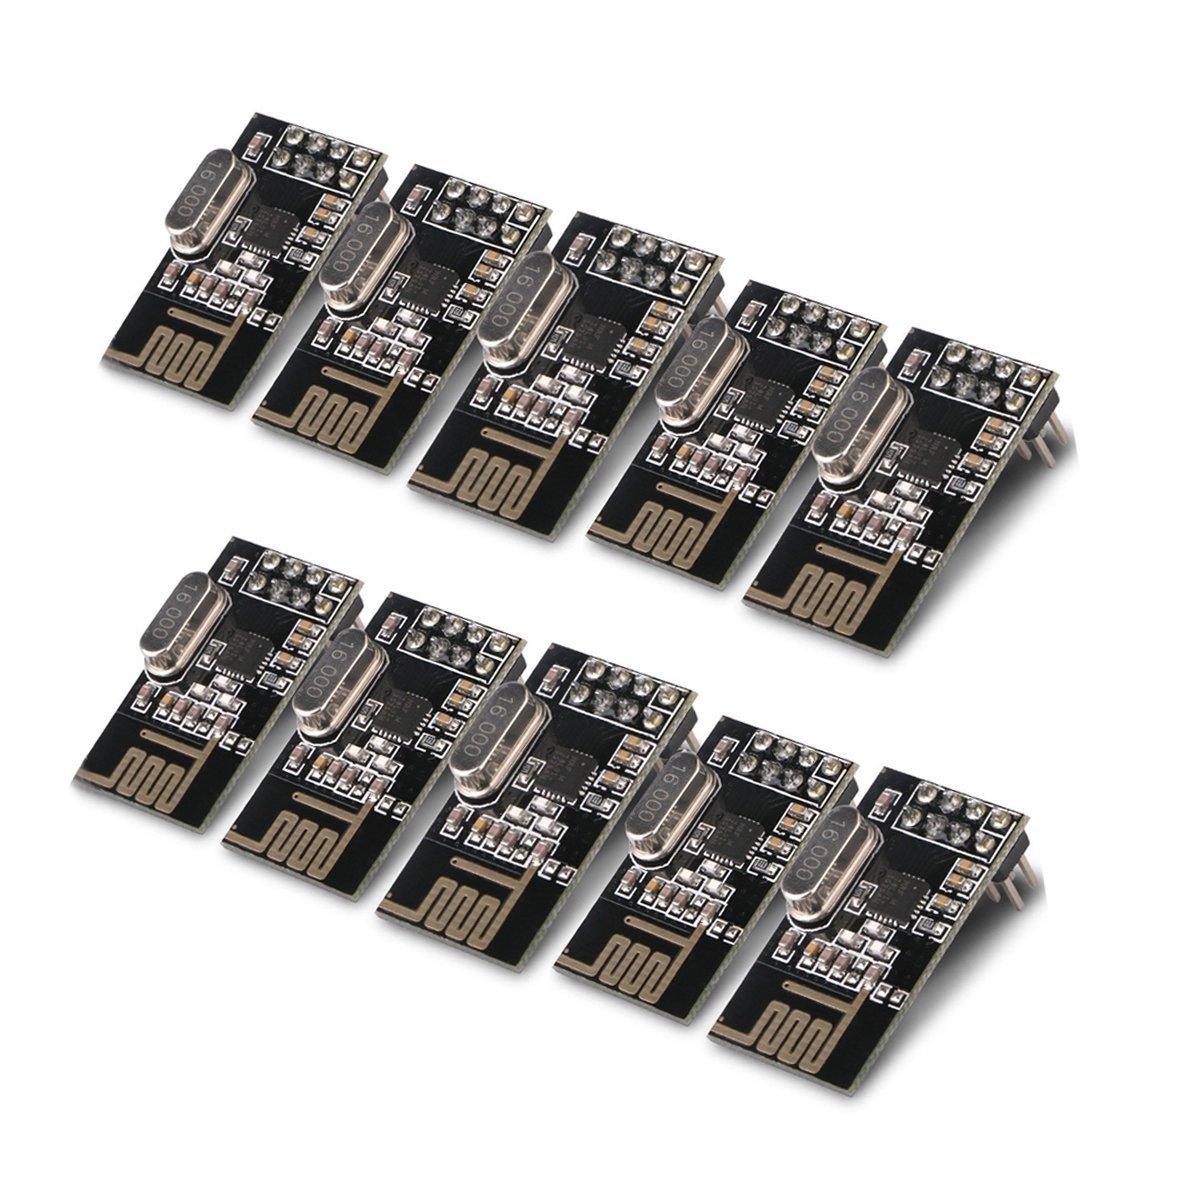 10pcs Arduino NRF24L01+ 2.4GHz Wireless RF Transceiver Module New Md trade